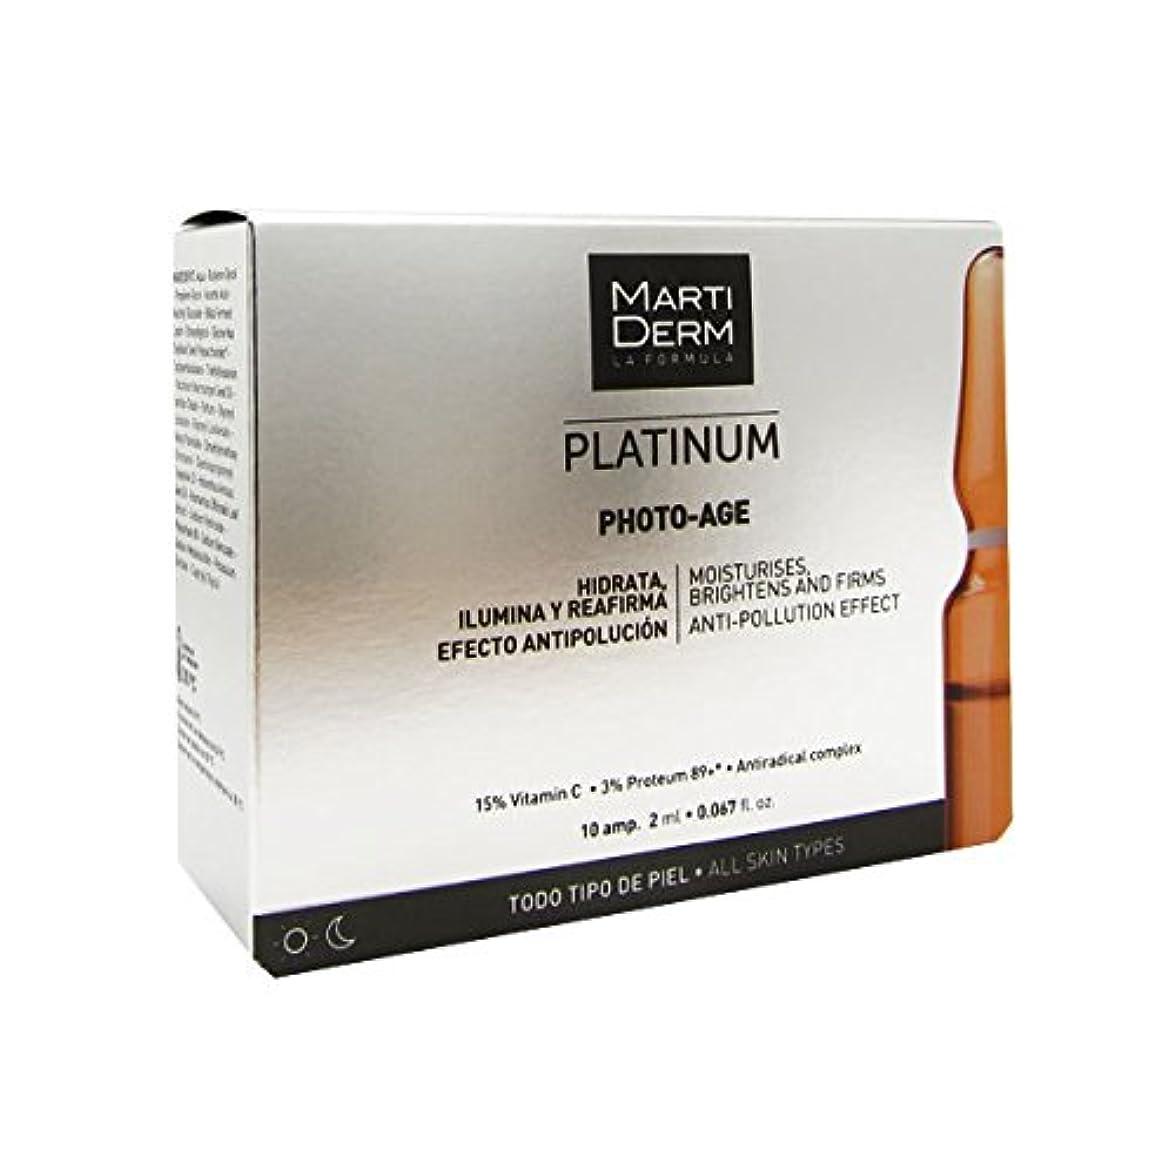 戦略学生緊張Martiderm Platinum Photo-age Ampoules 10amp [並行輸入品]